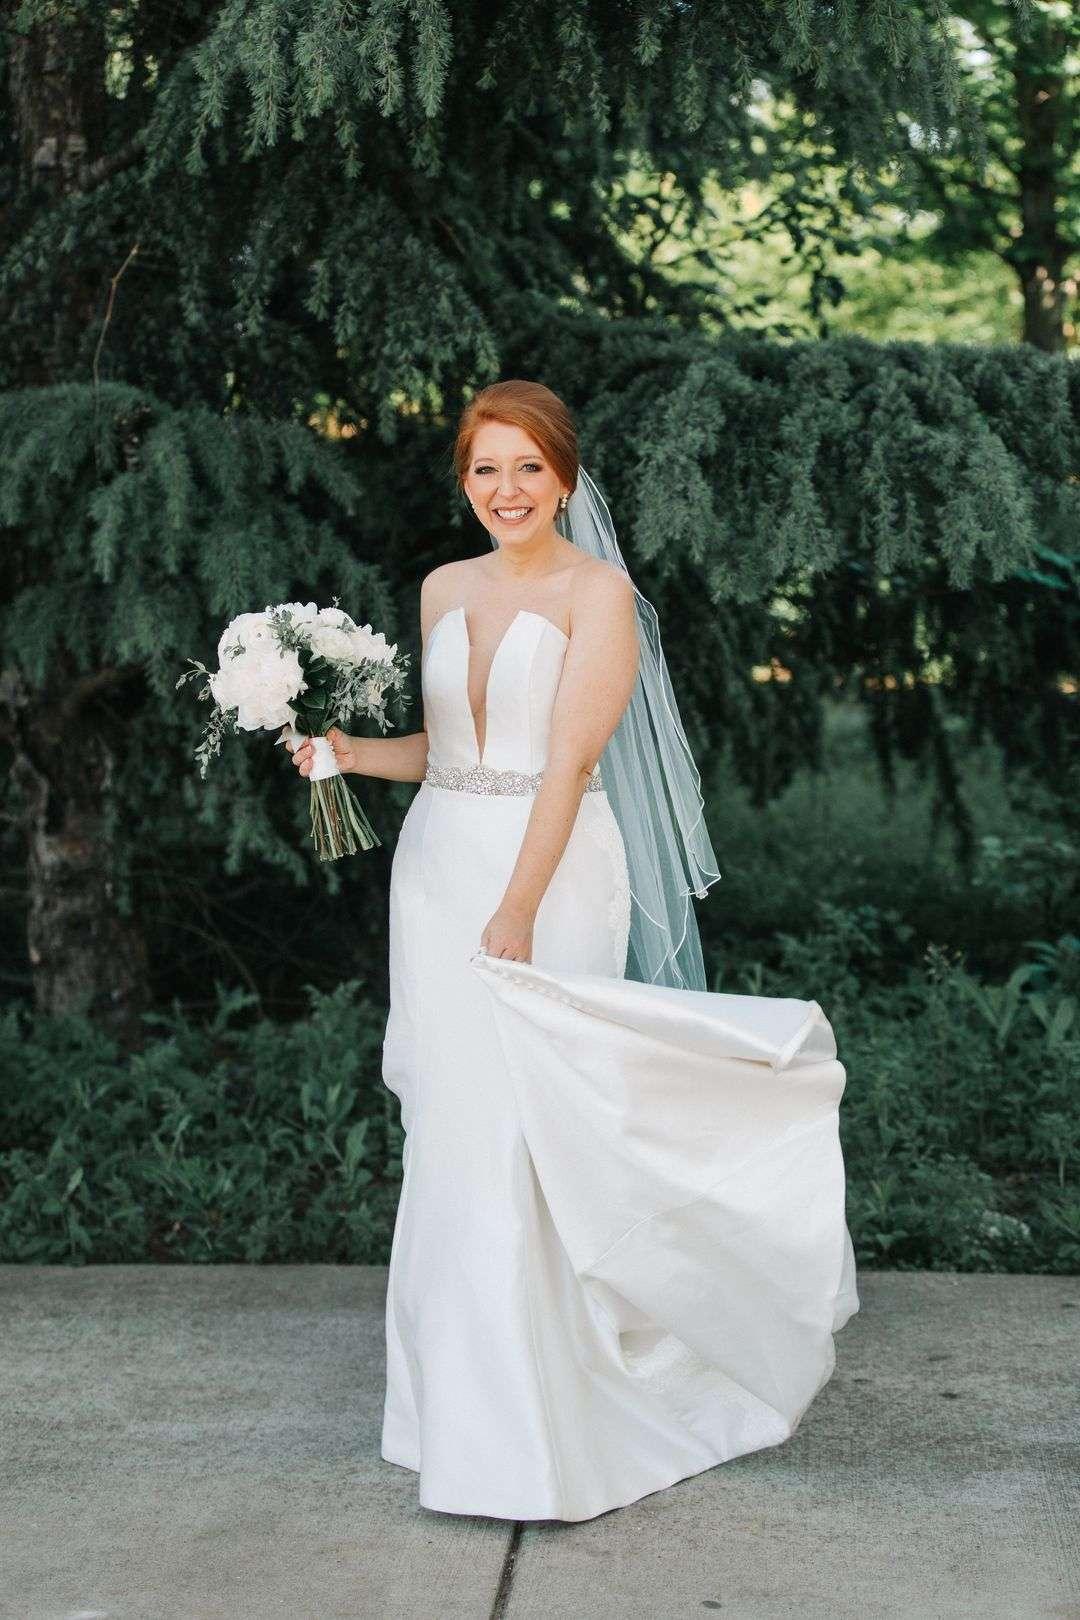 brie wearing white wedding dress, bridal portraits